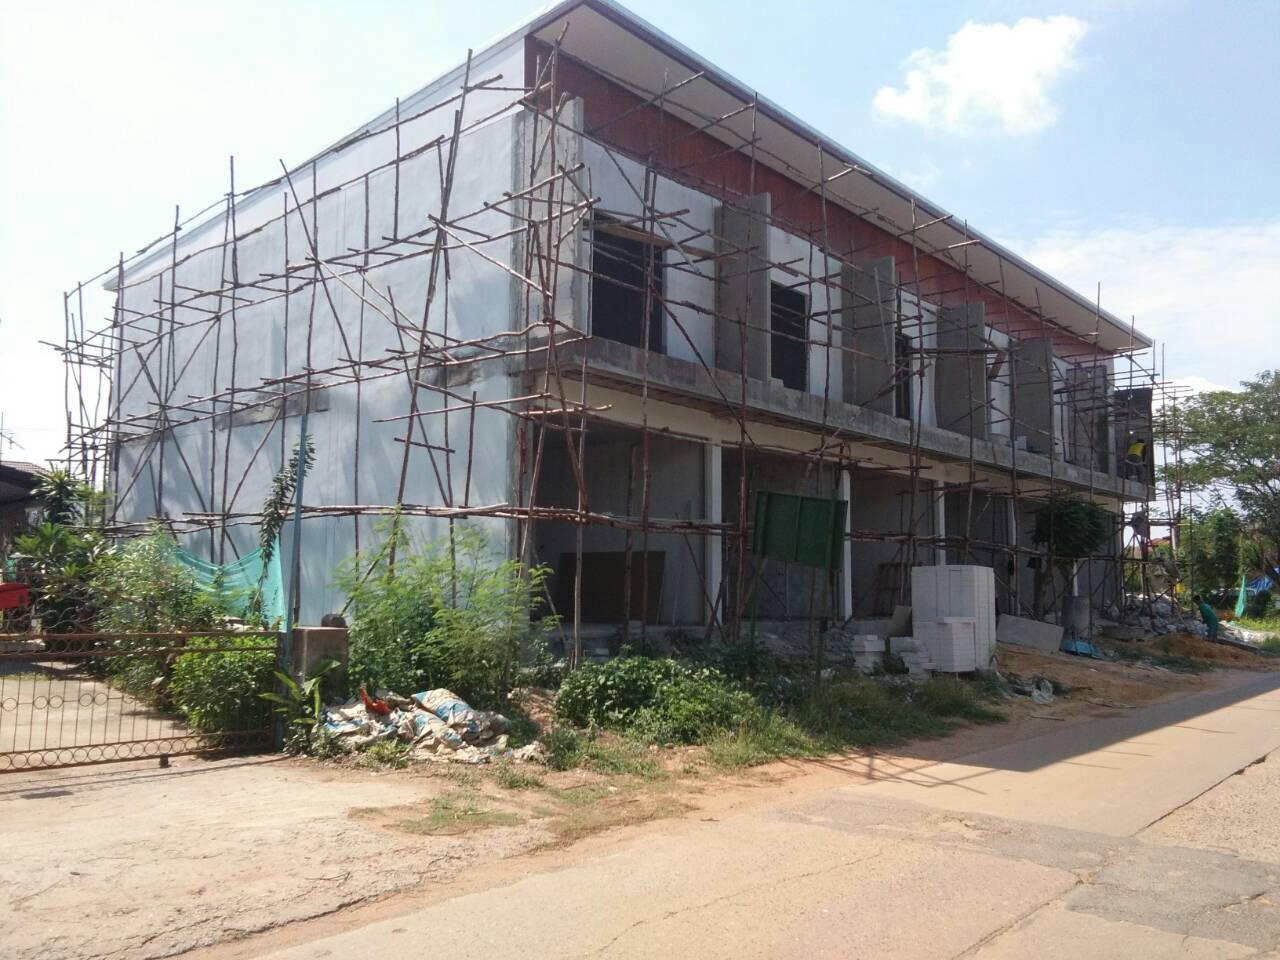 Khon Kaen Housebuilder (6) Khon Kaen construction khon kaen building company.jpe